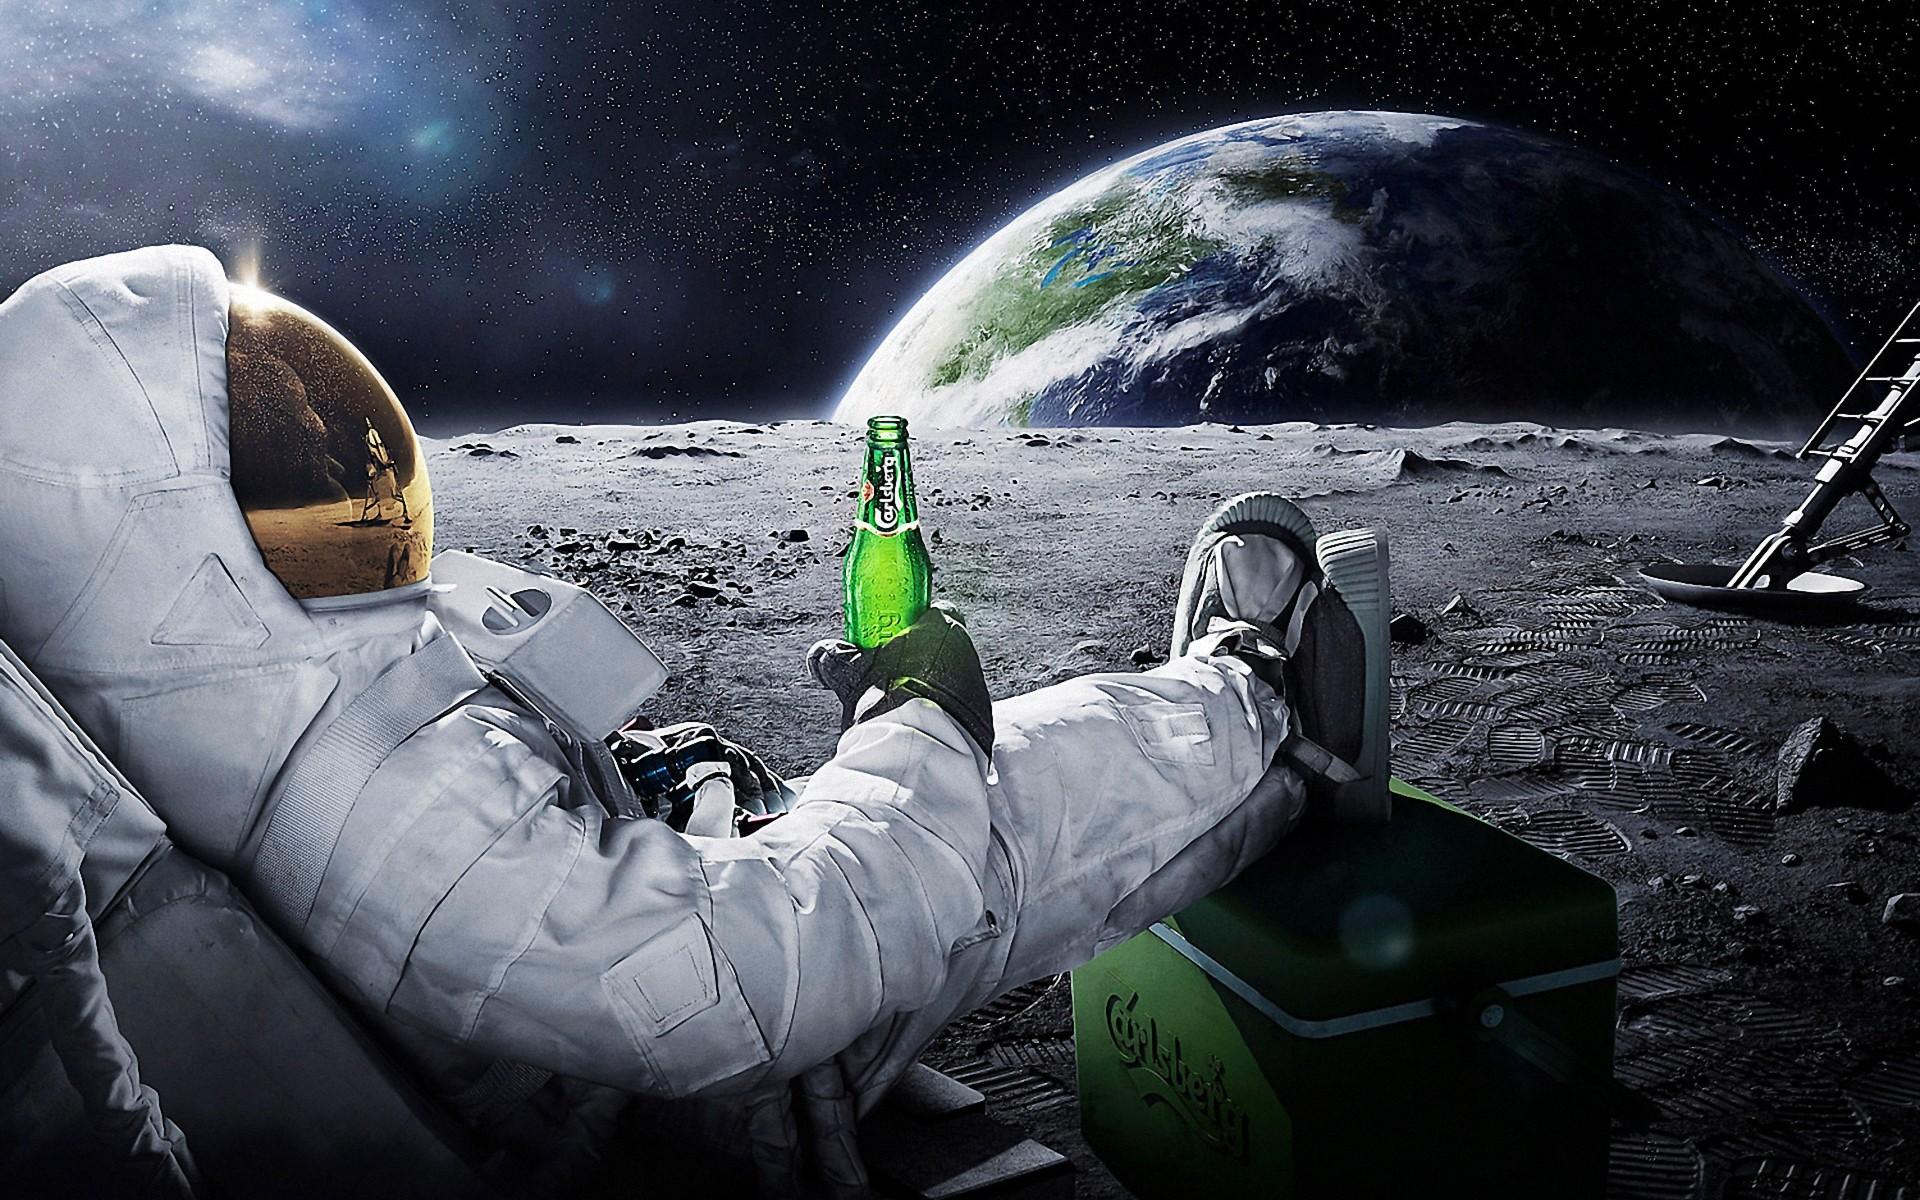 космос трава космонавт space grass astronaut бесплатно